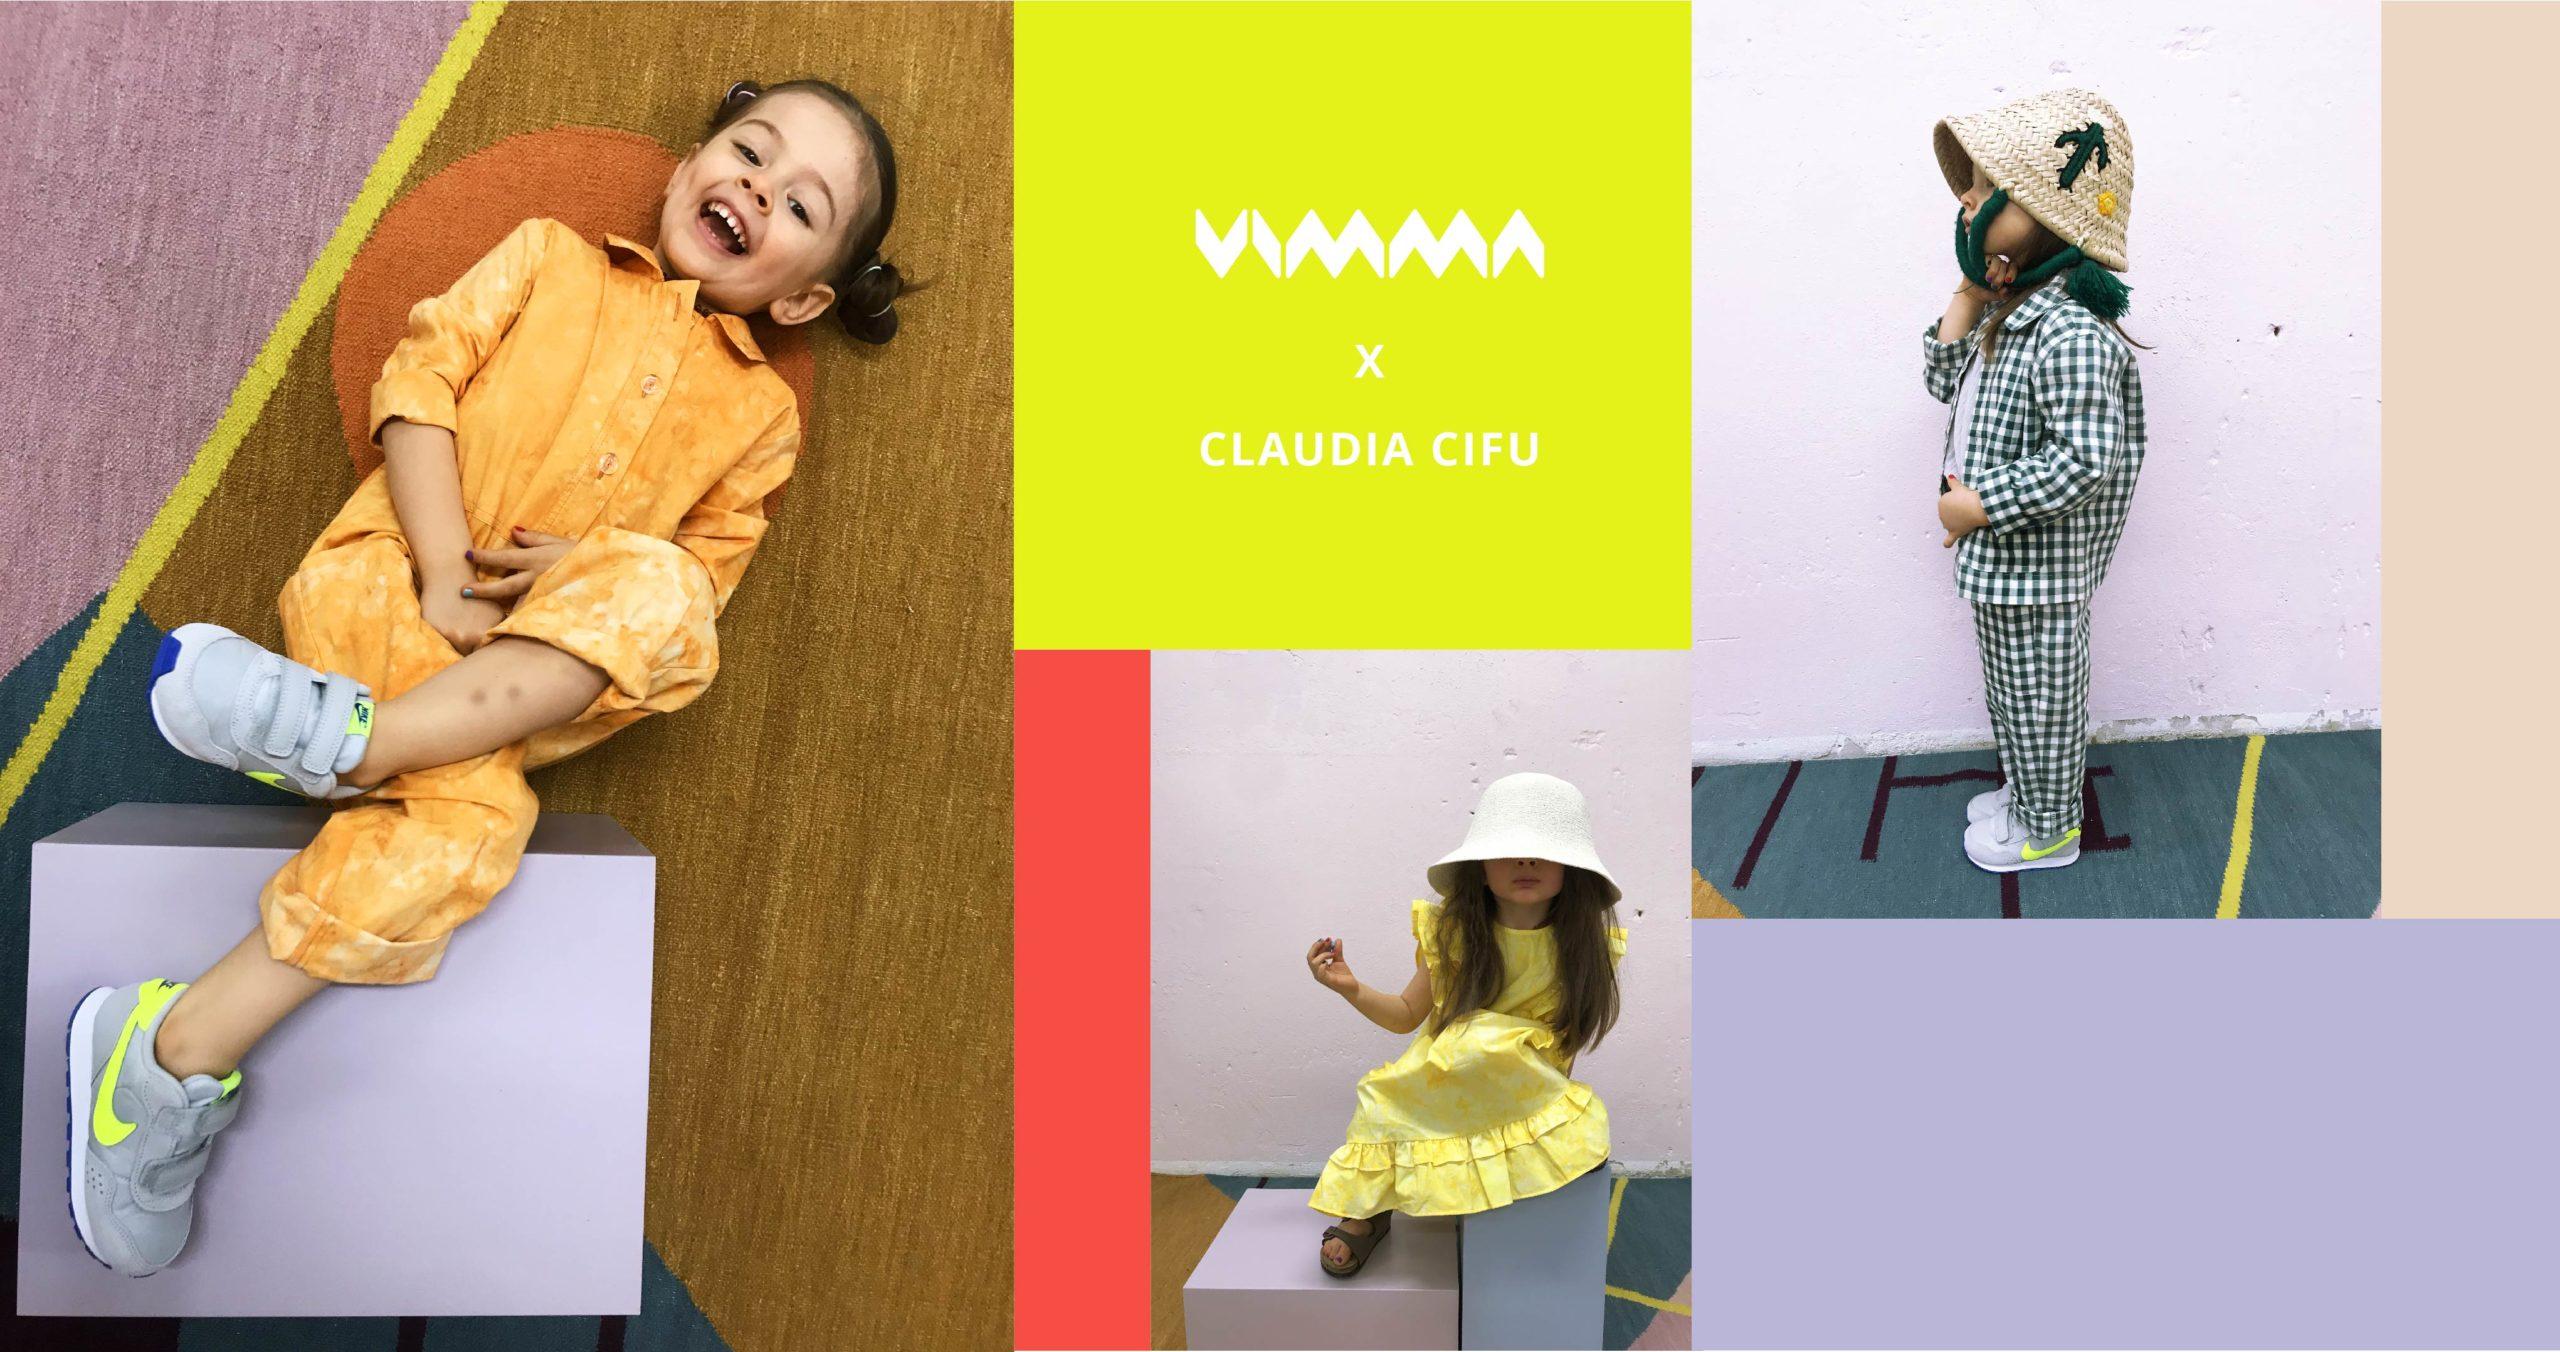 VIMMA x CLAUDIA CIFU